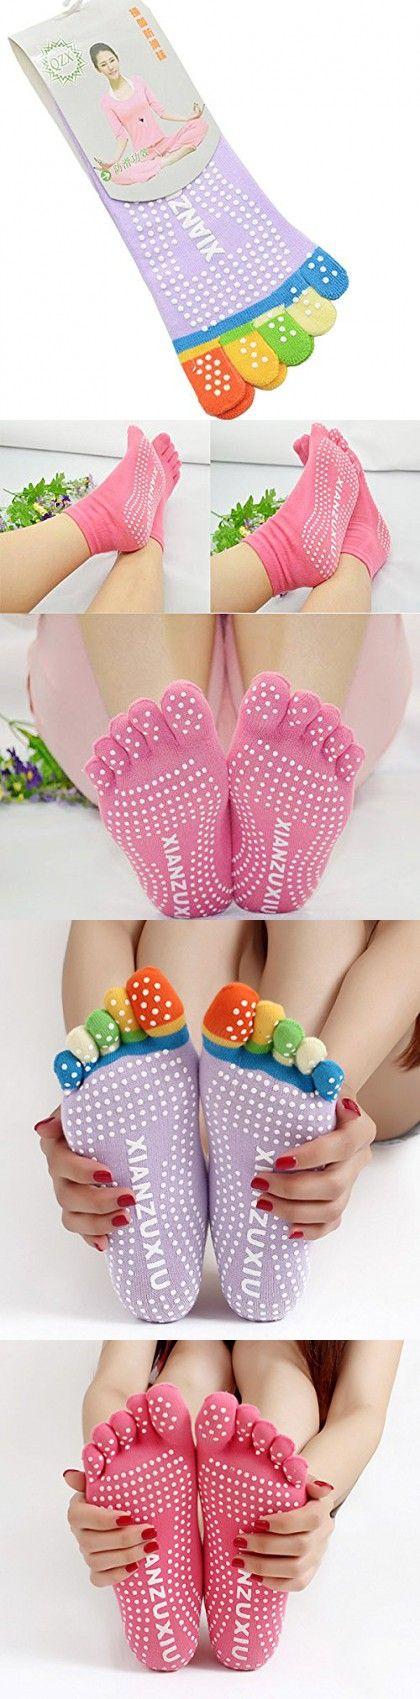 MochoHome 5-Toe Yoga/Pilates Socks with Full Grip, Small/Medium, Light Purple with Colorful Toes